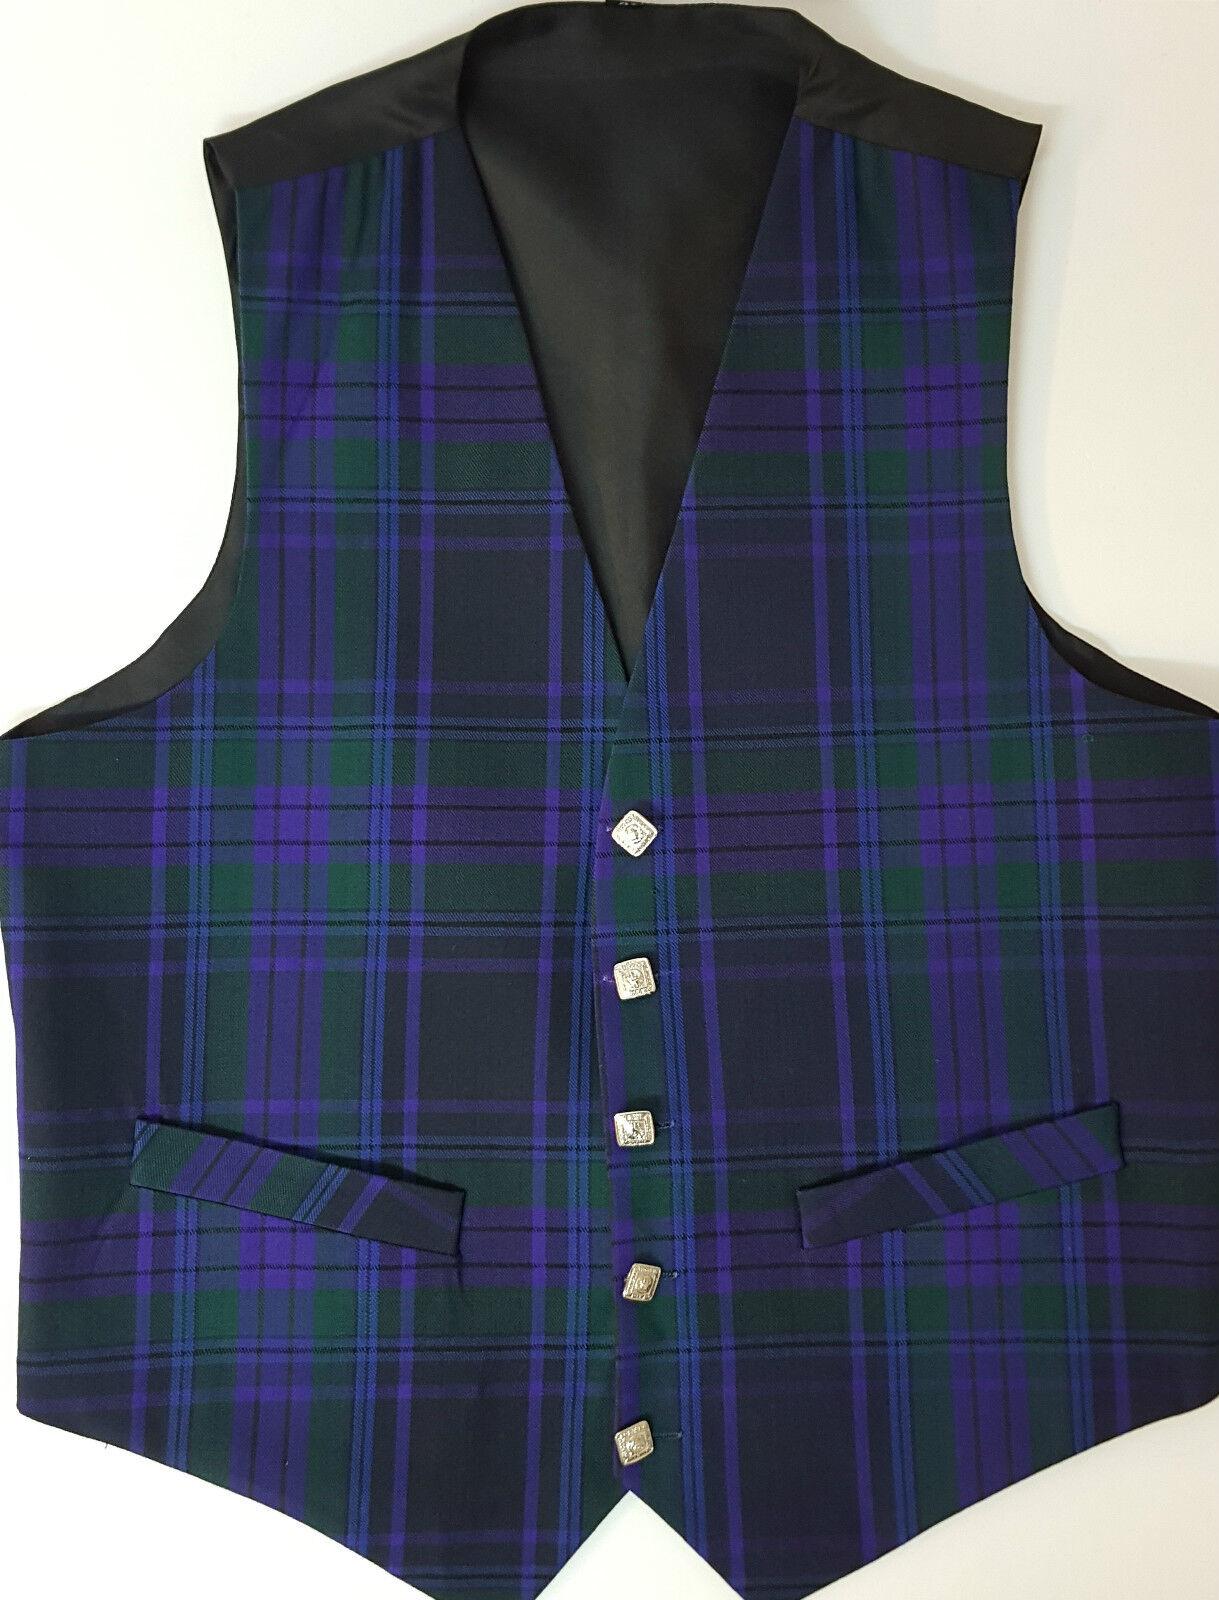 Spirit Of Scotland tartan waistcoat vest 4 Kilts REDUCED to clear